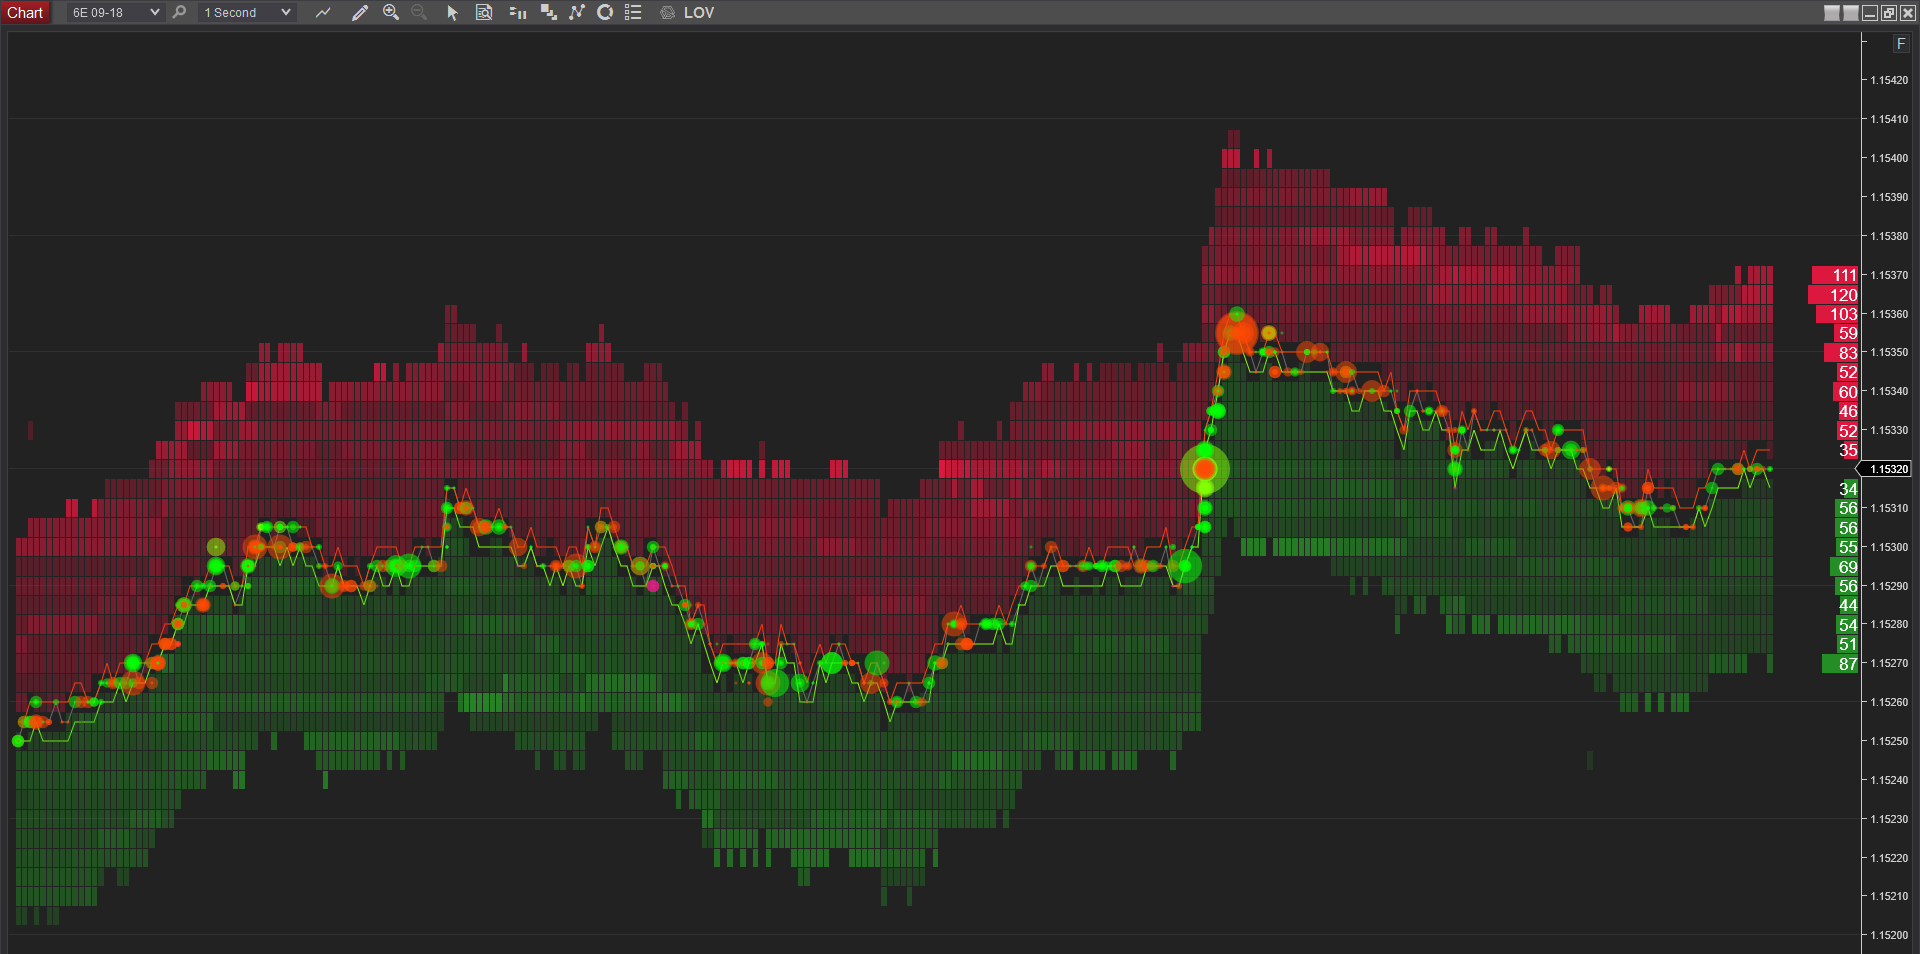 Euro FX Futures Quotes One Tick Chart big. Limit Orders, market liquidity, market Depth, Orderflow analysis NinjaTrader Chart